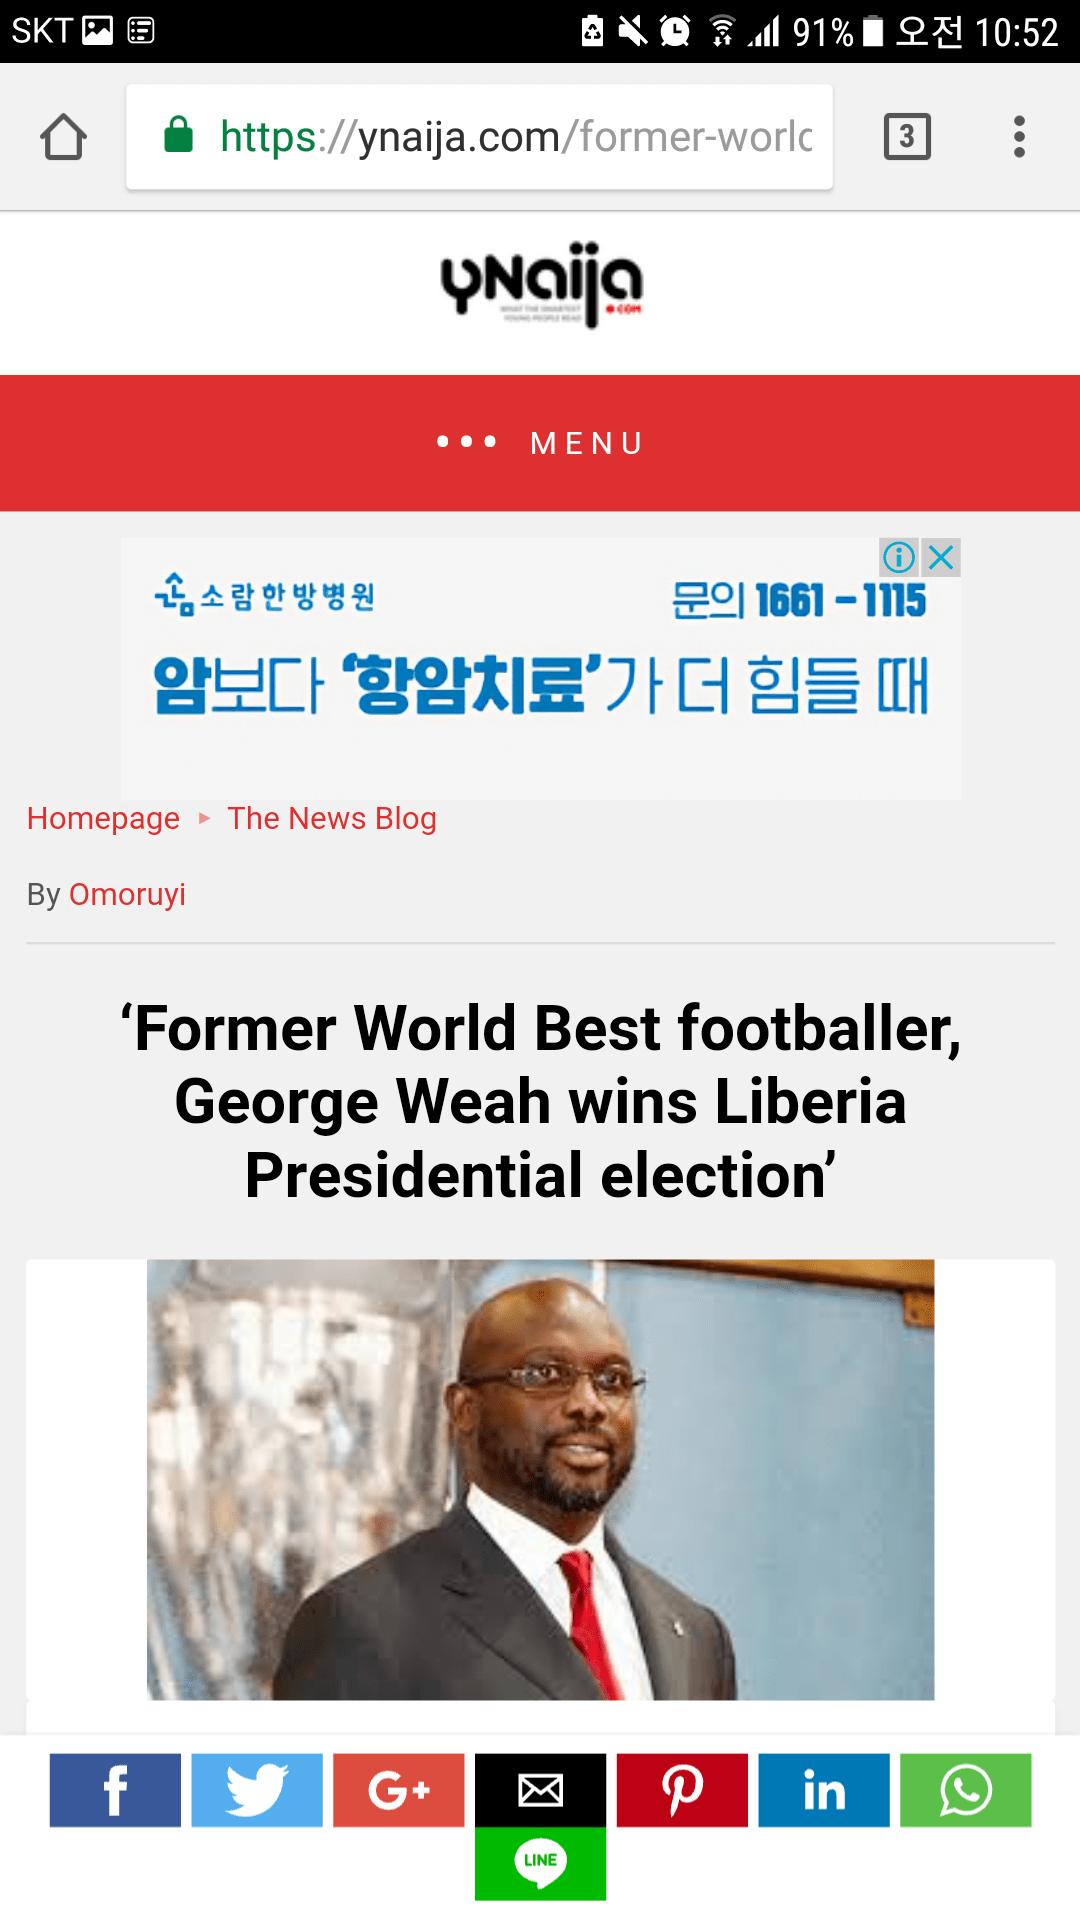 Screenshot_20171012-105239.png 웨아 진짜 대통령 당선된건가